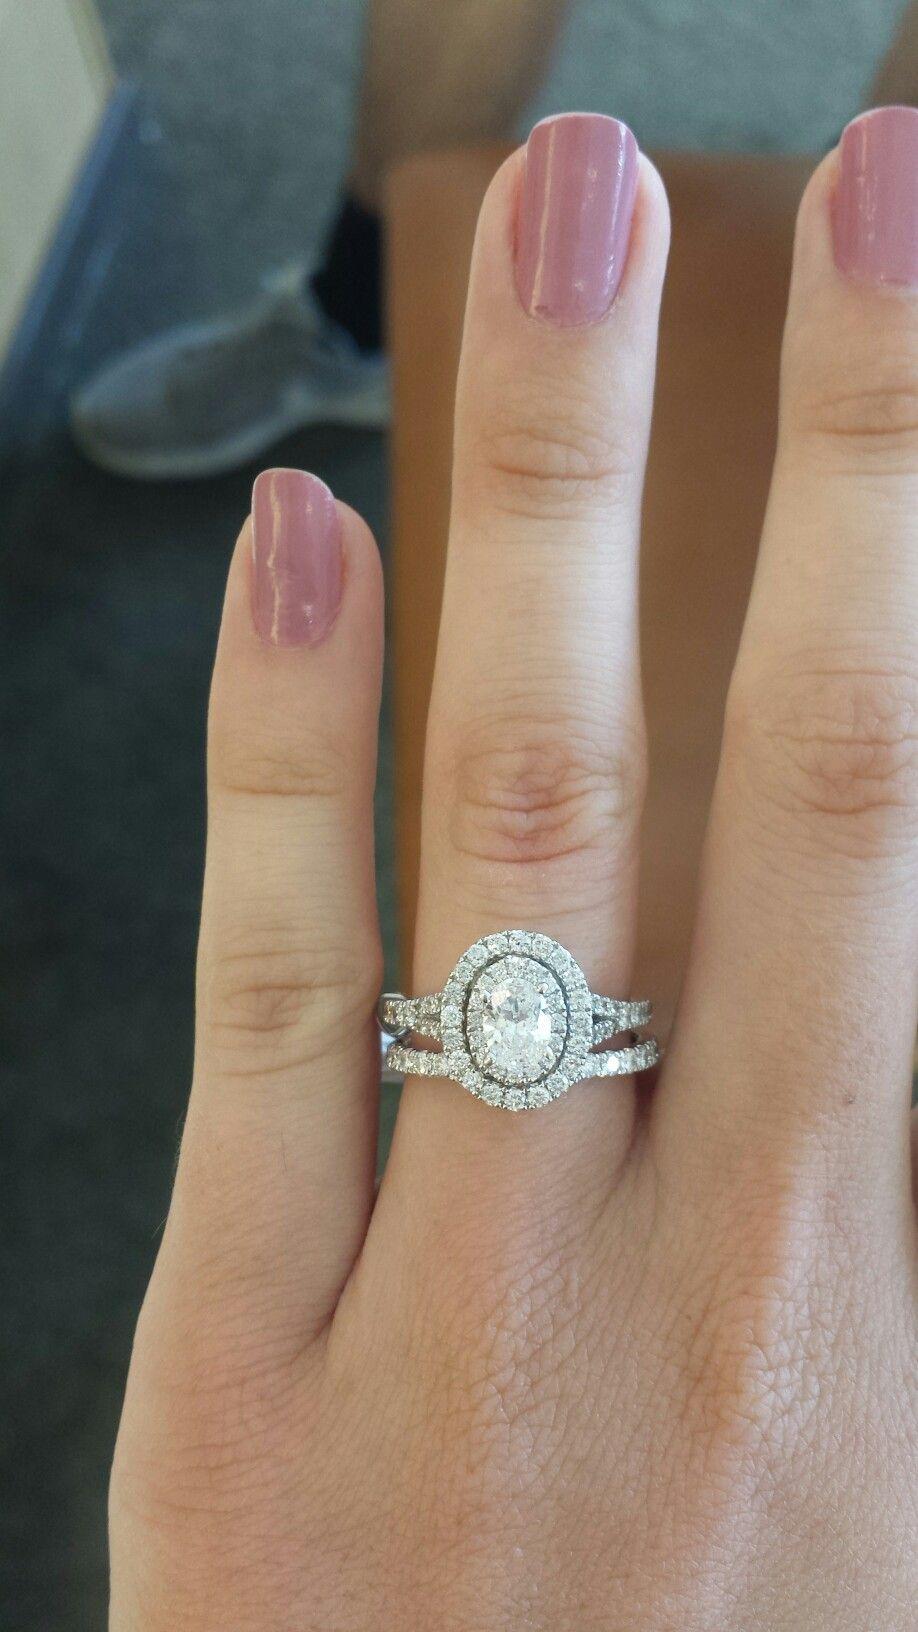 neil lane wedding rings Neil Lane Dimond Oval engagement rings Wedding band Double halo